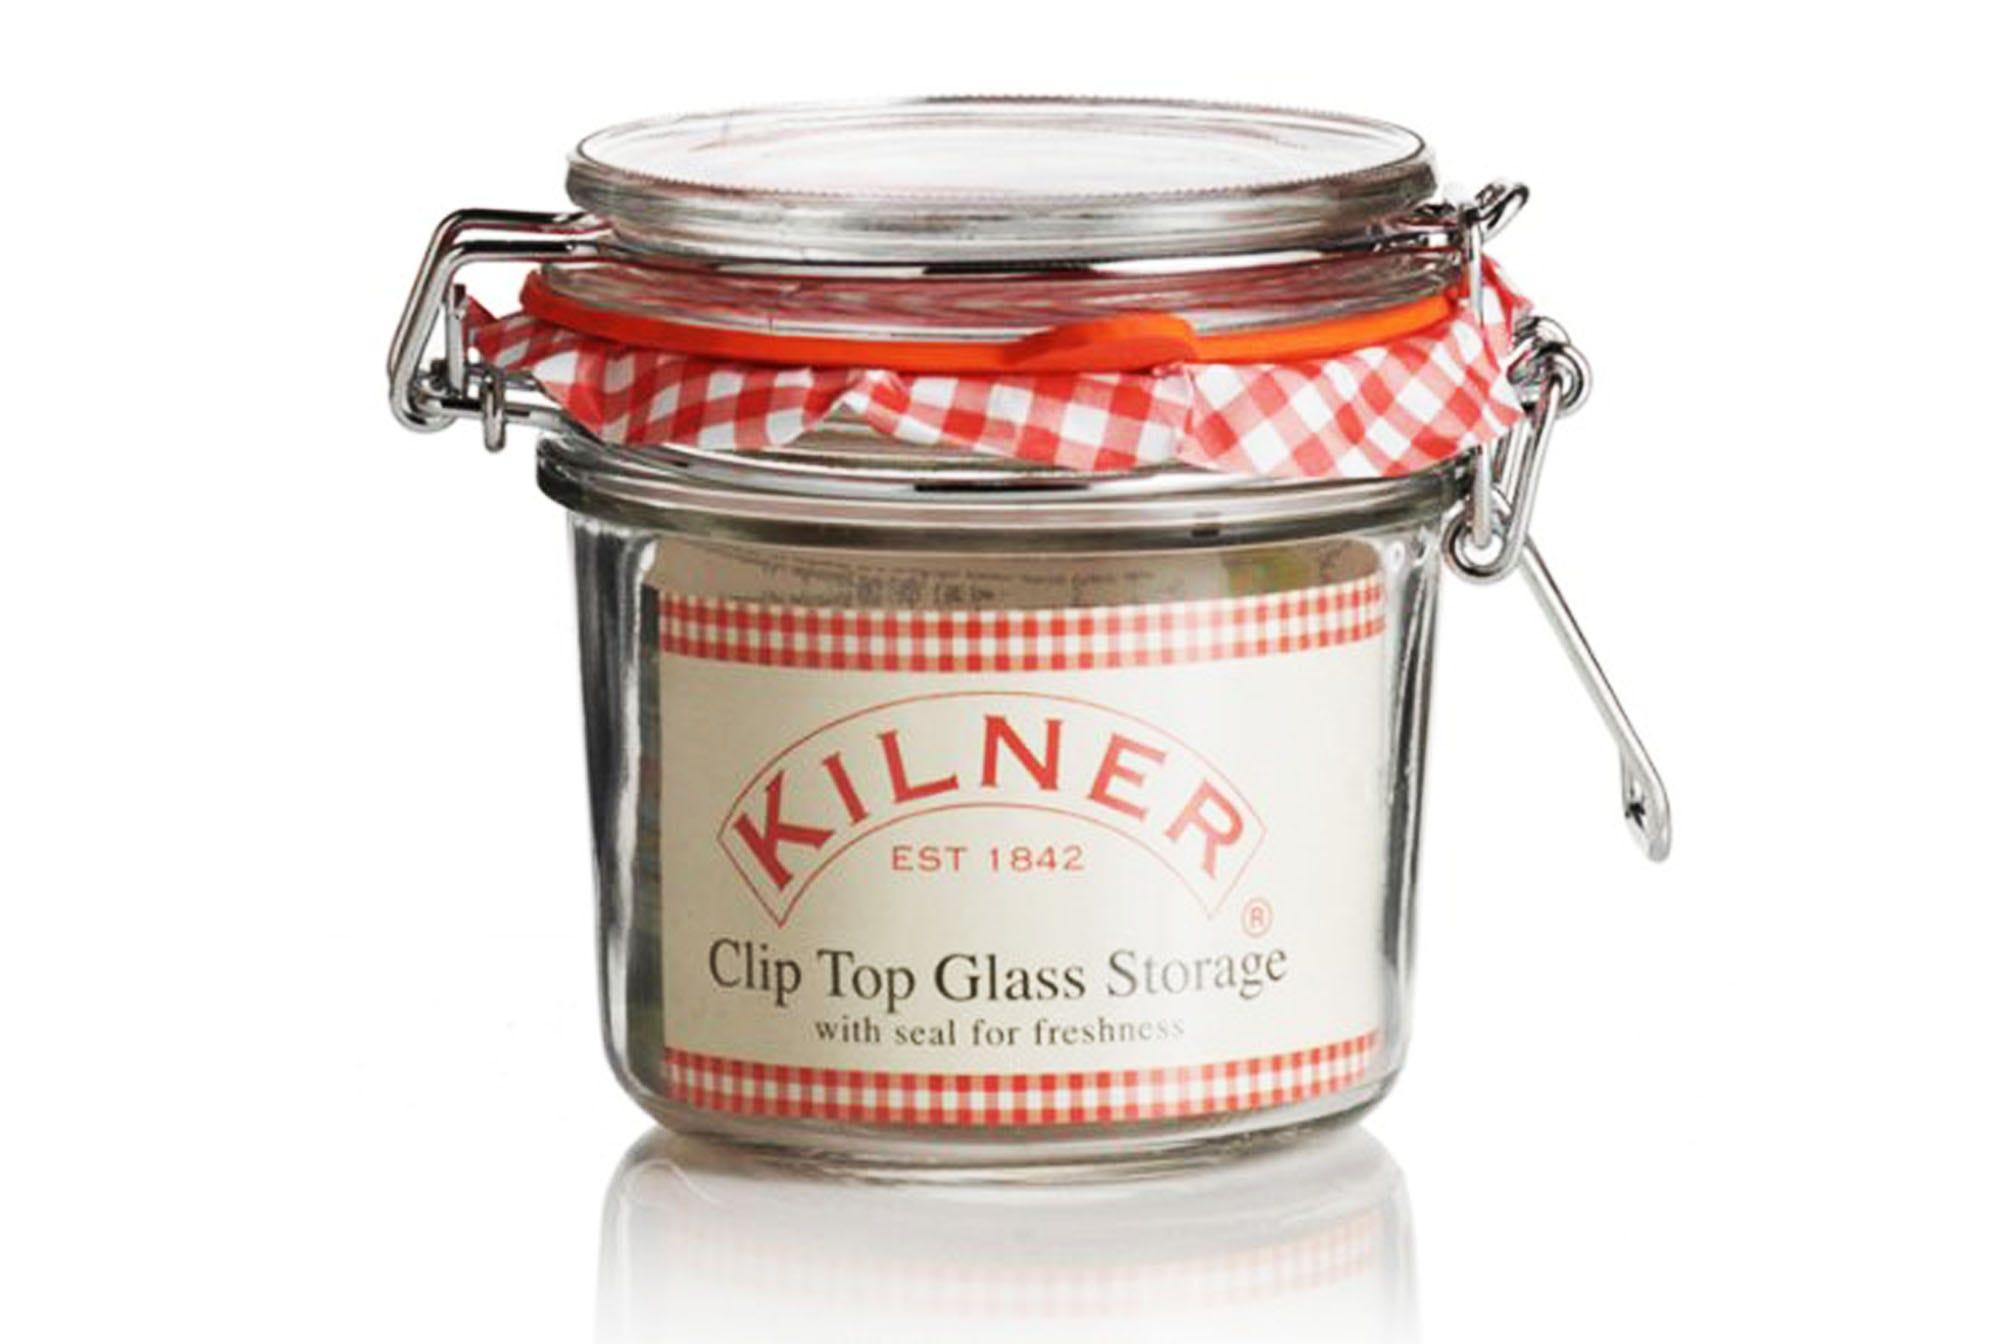 Compare prices for Kilner Preserve 0.35L Clip Top Round Jar